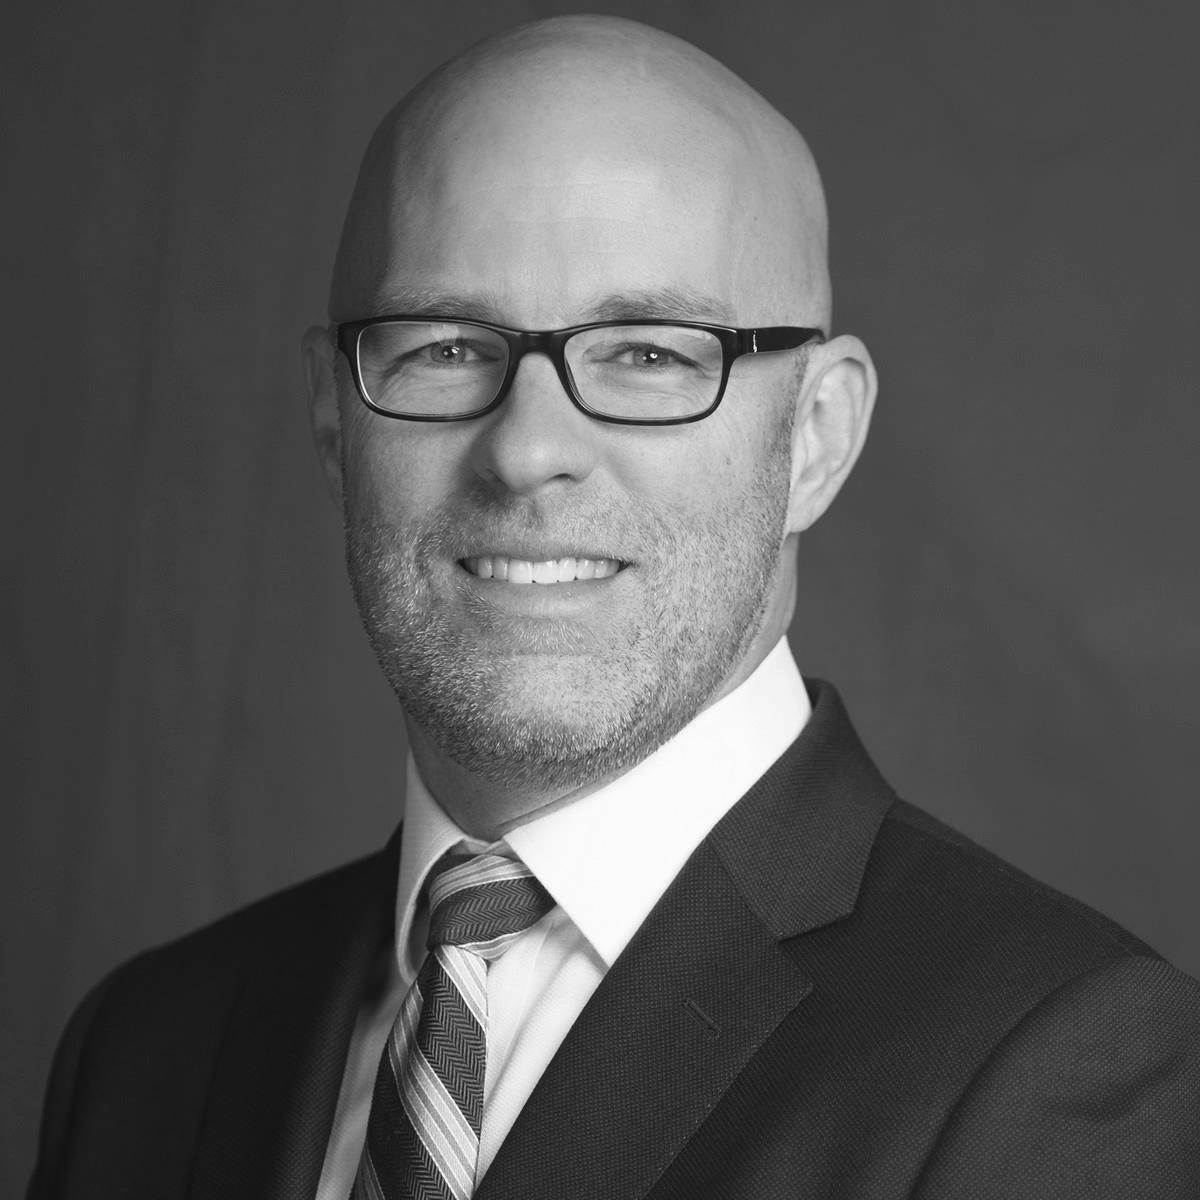 Daniel Nielsen, Managing Director, Senior Portfolio Specialist & Head of ESG and Responsible Investing; Great Lakes Advisors